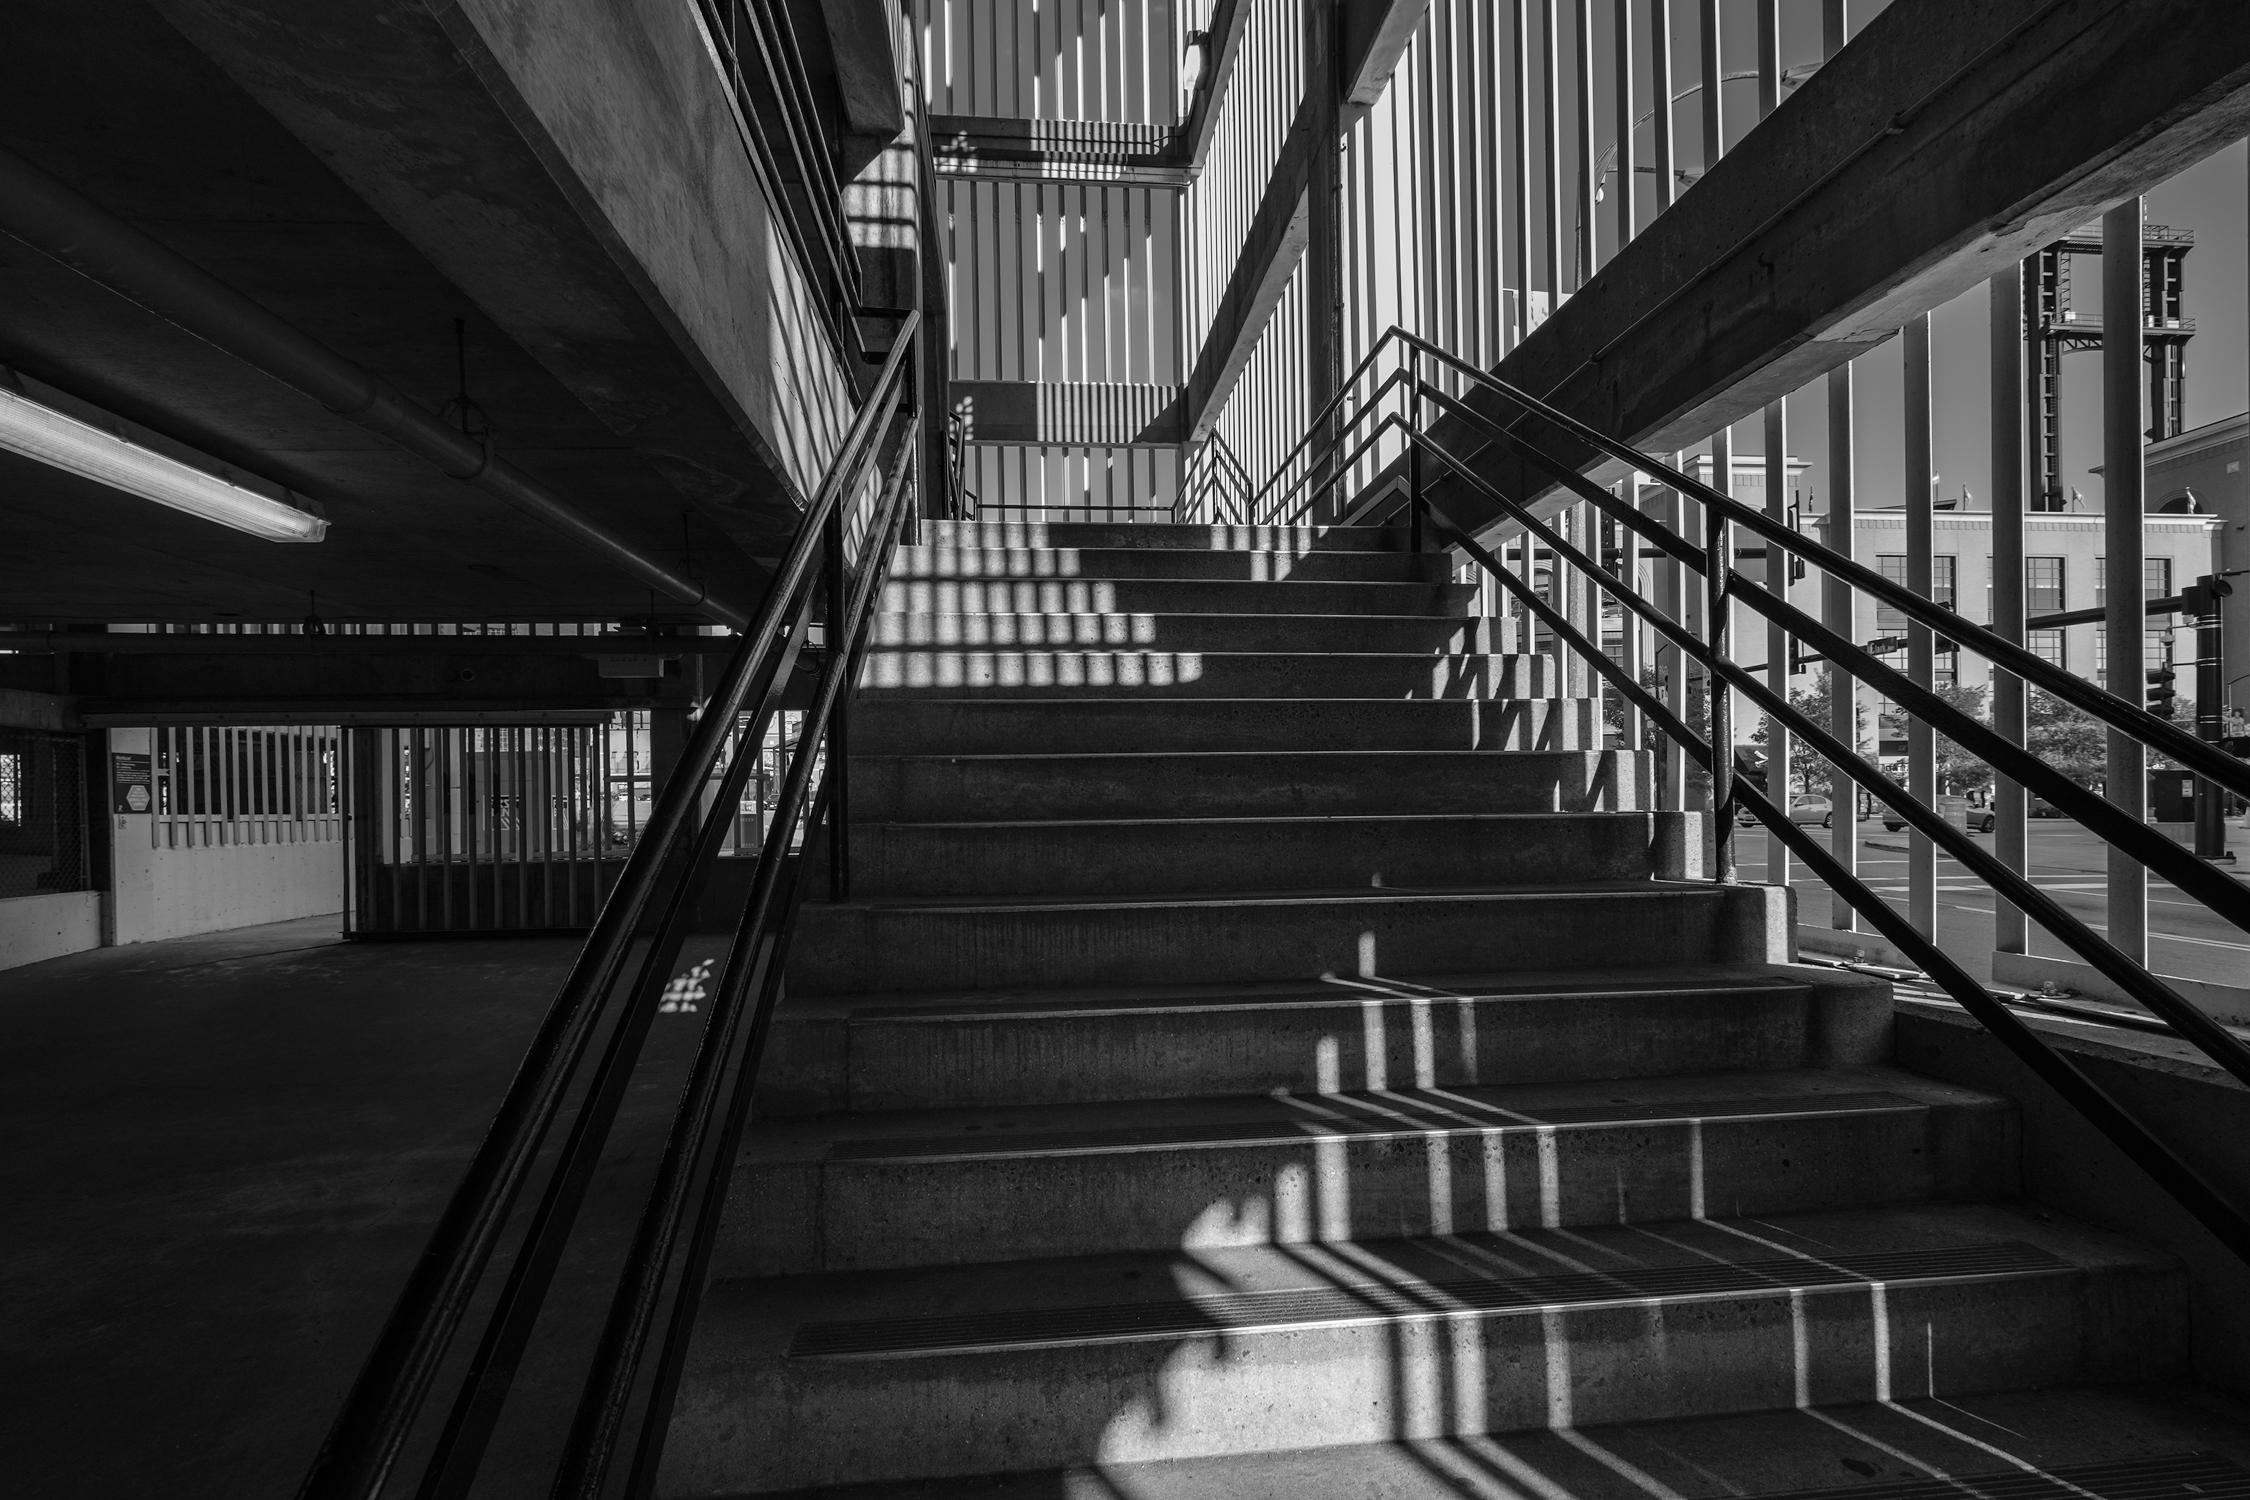 Crossing shadows climb a concrete stairway. Fuji X-Pro 2 and a Fujinon 10-24mm f3.5.